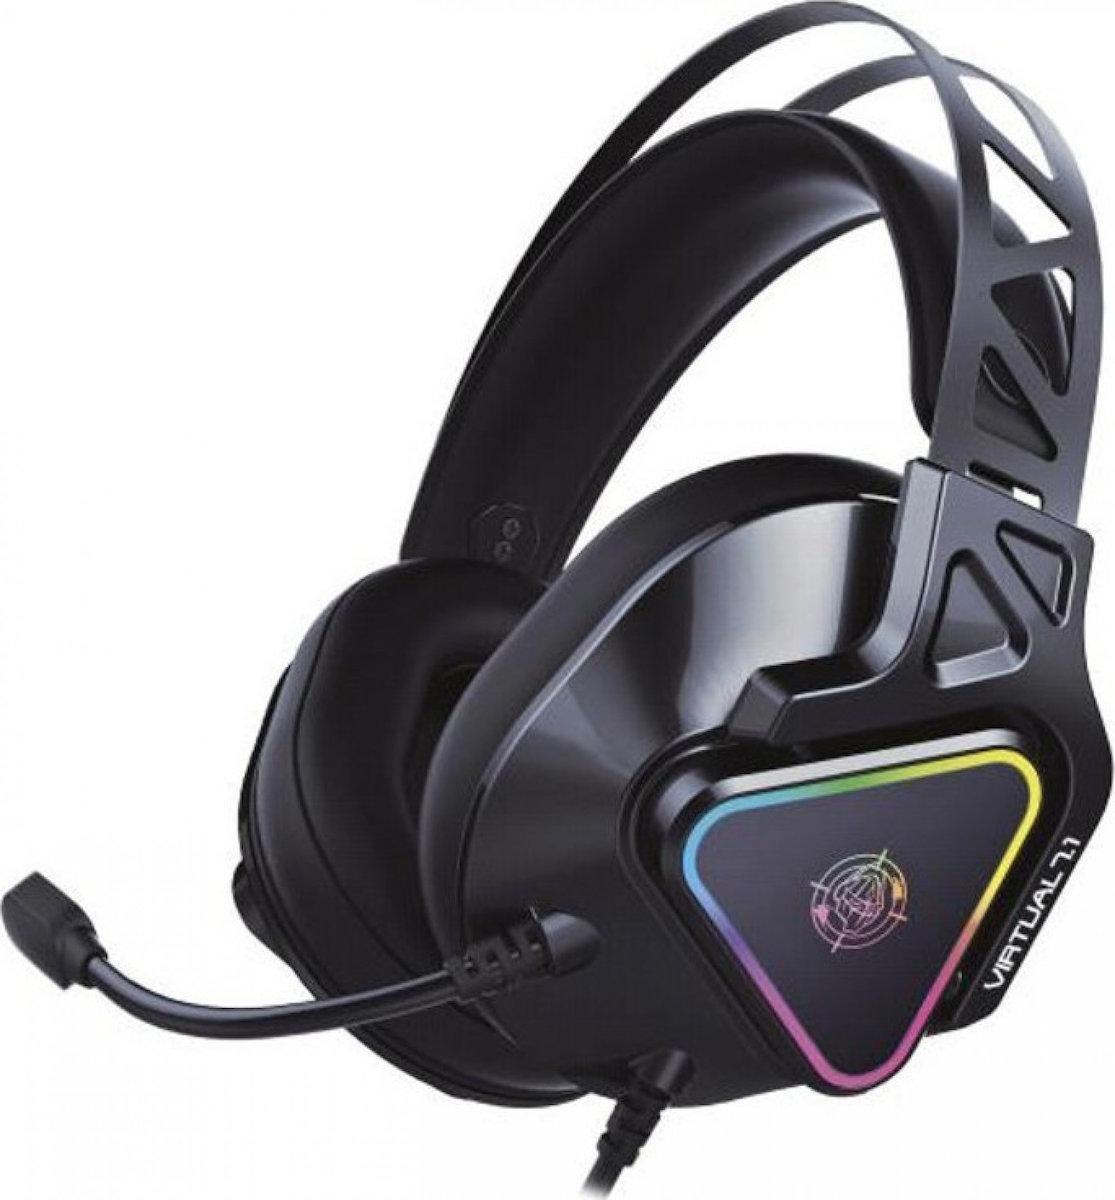 Zeroground HD-3000G Akechi PRO USB 7.1 Gaming Headset